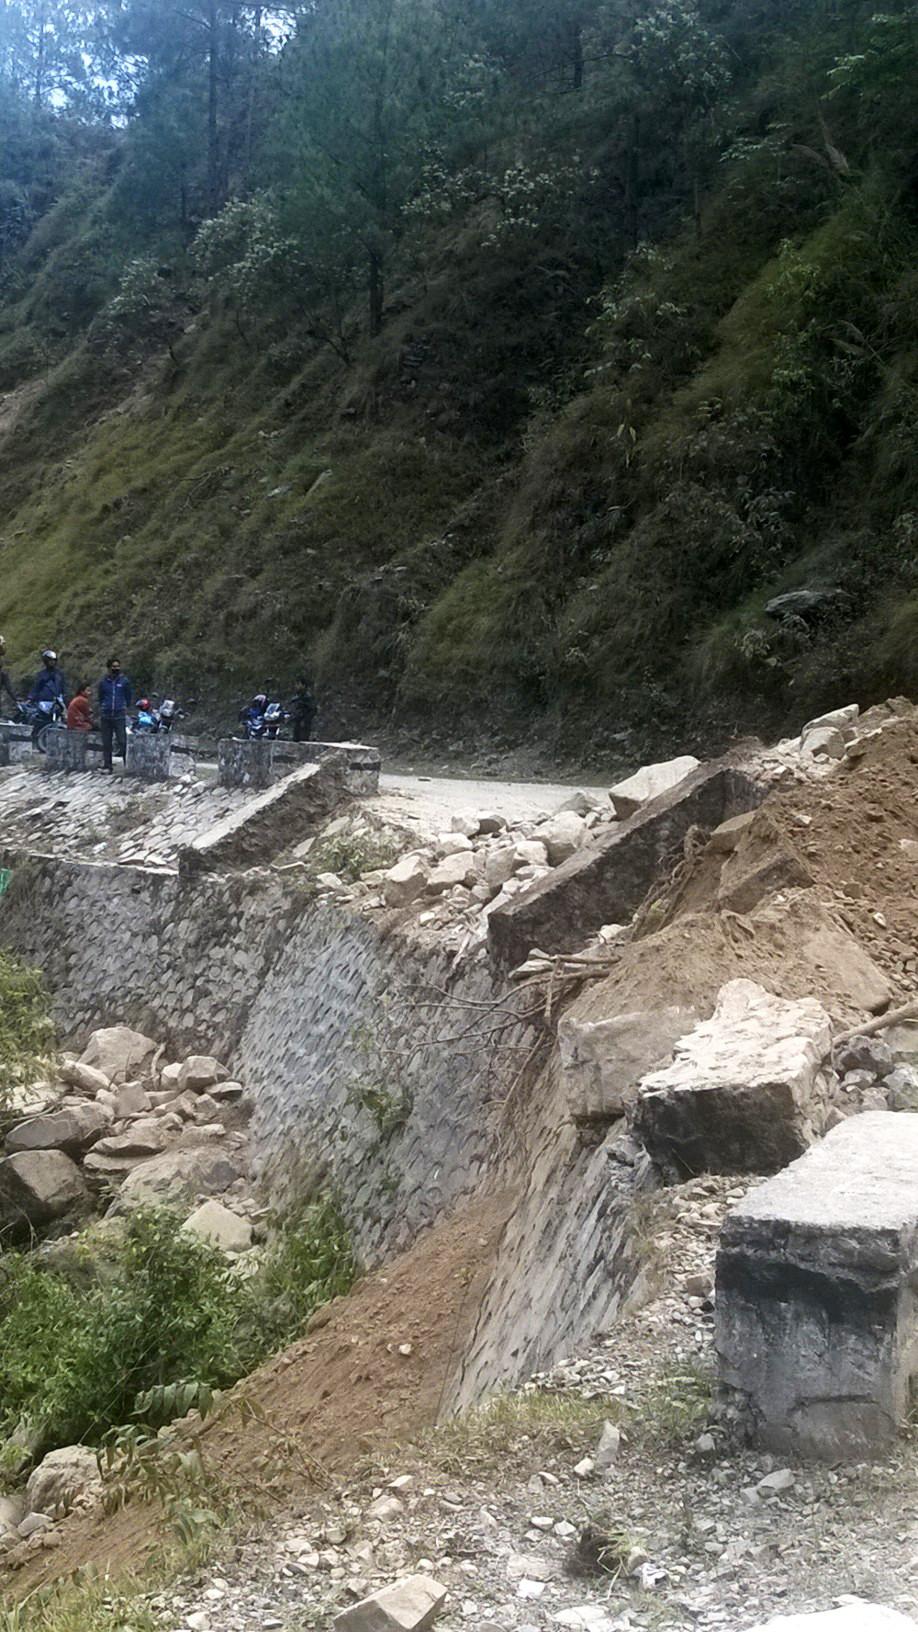 The road to Kathmandu after the Nepal earthquake